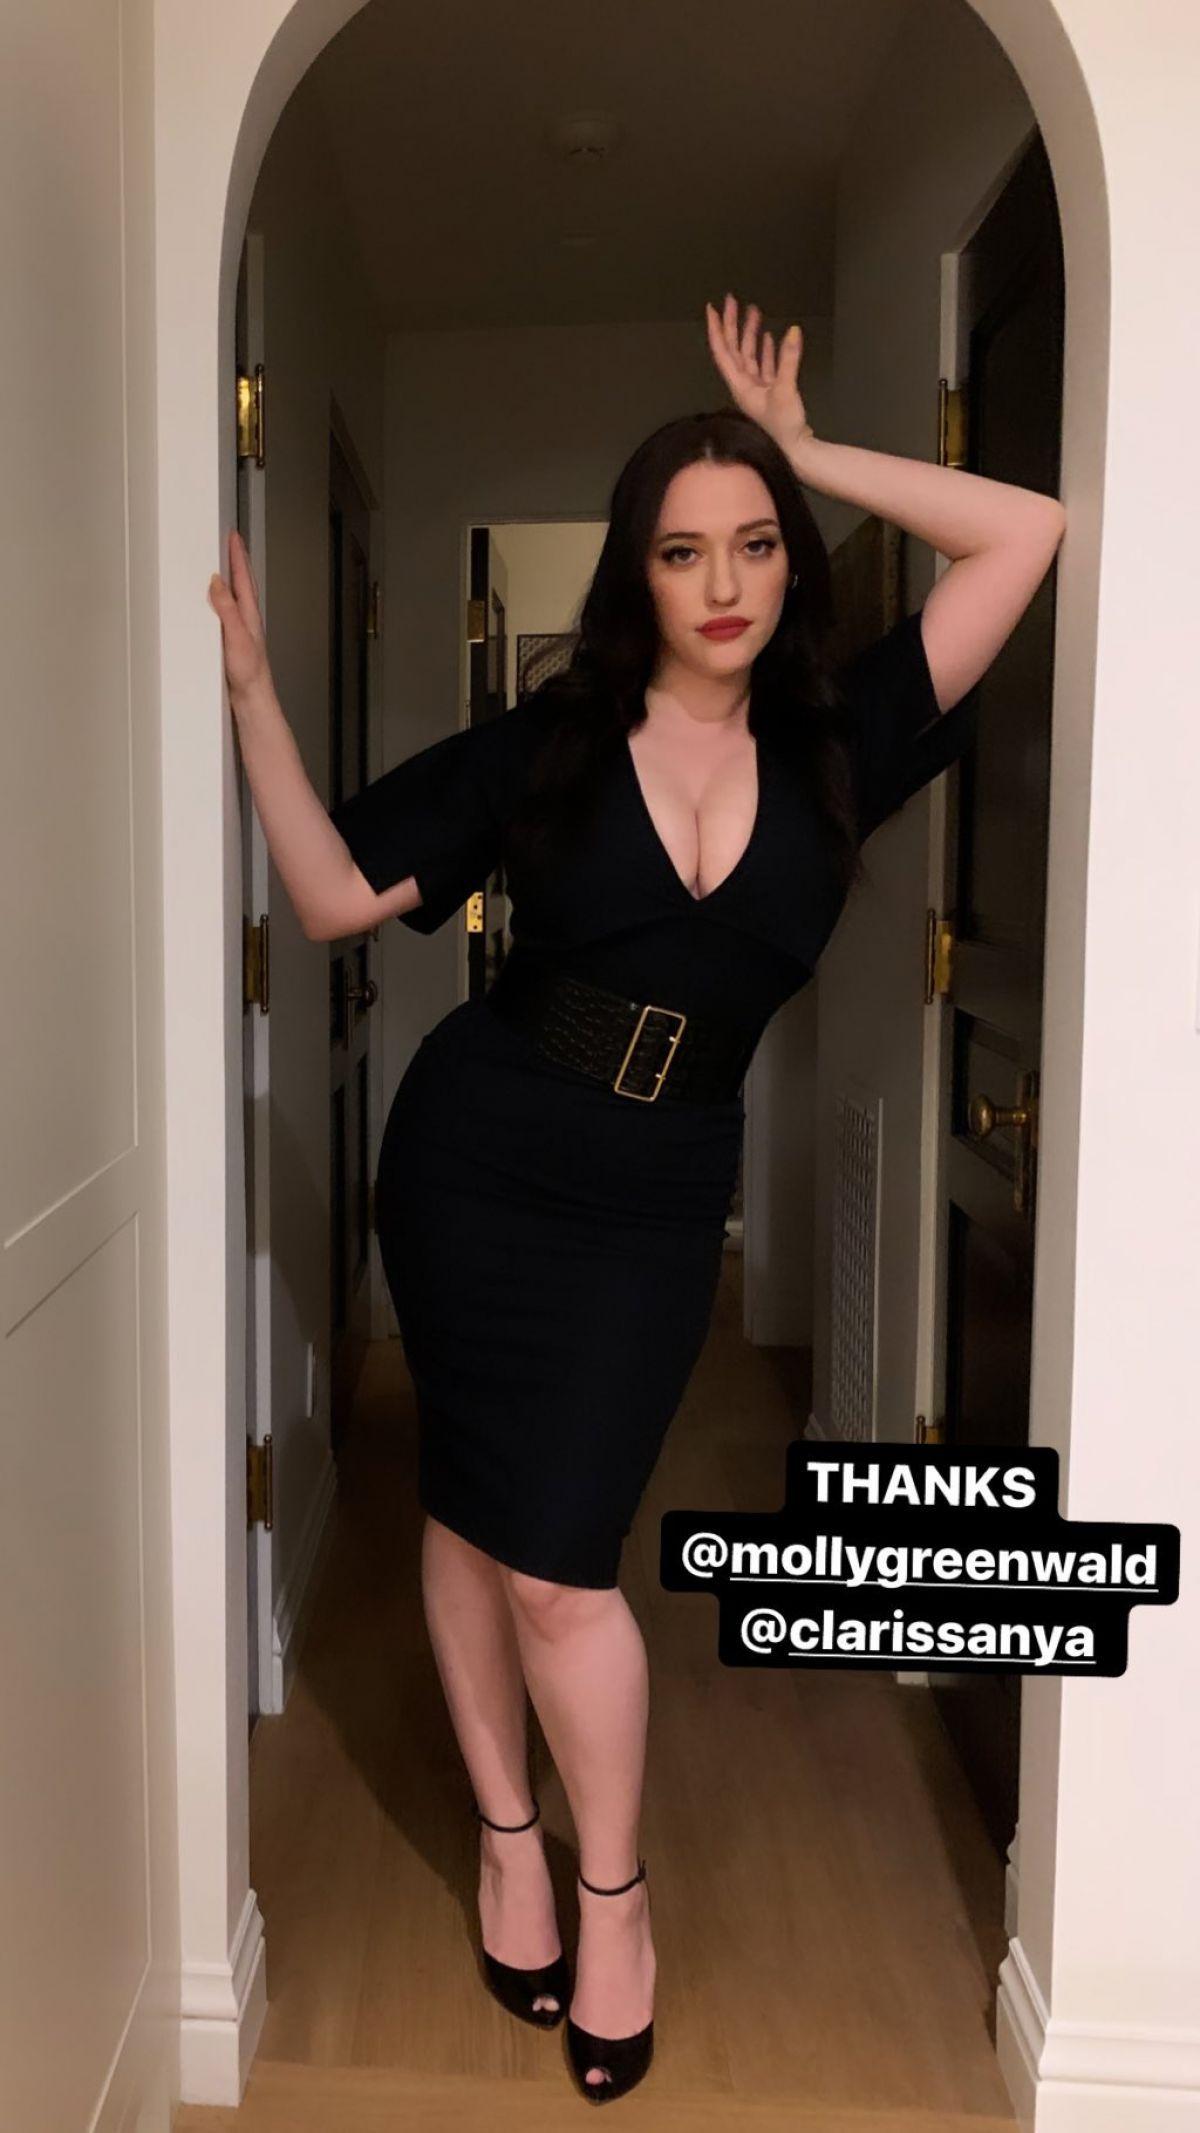 Kat Dennings In A Black Dress Instagram Photos 11 20 2019 Kat Dennings Curvy Girl Fashion Black Dress [ 2133 x 1200 Pixel ]